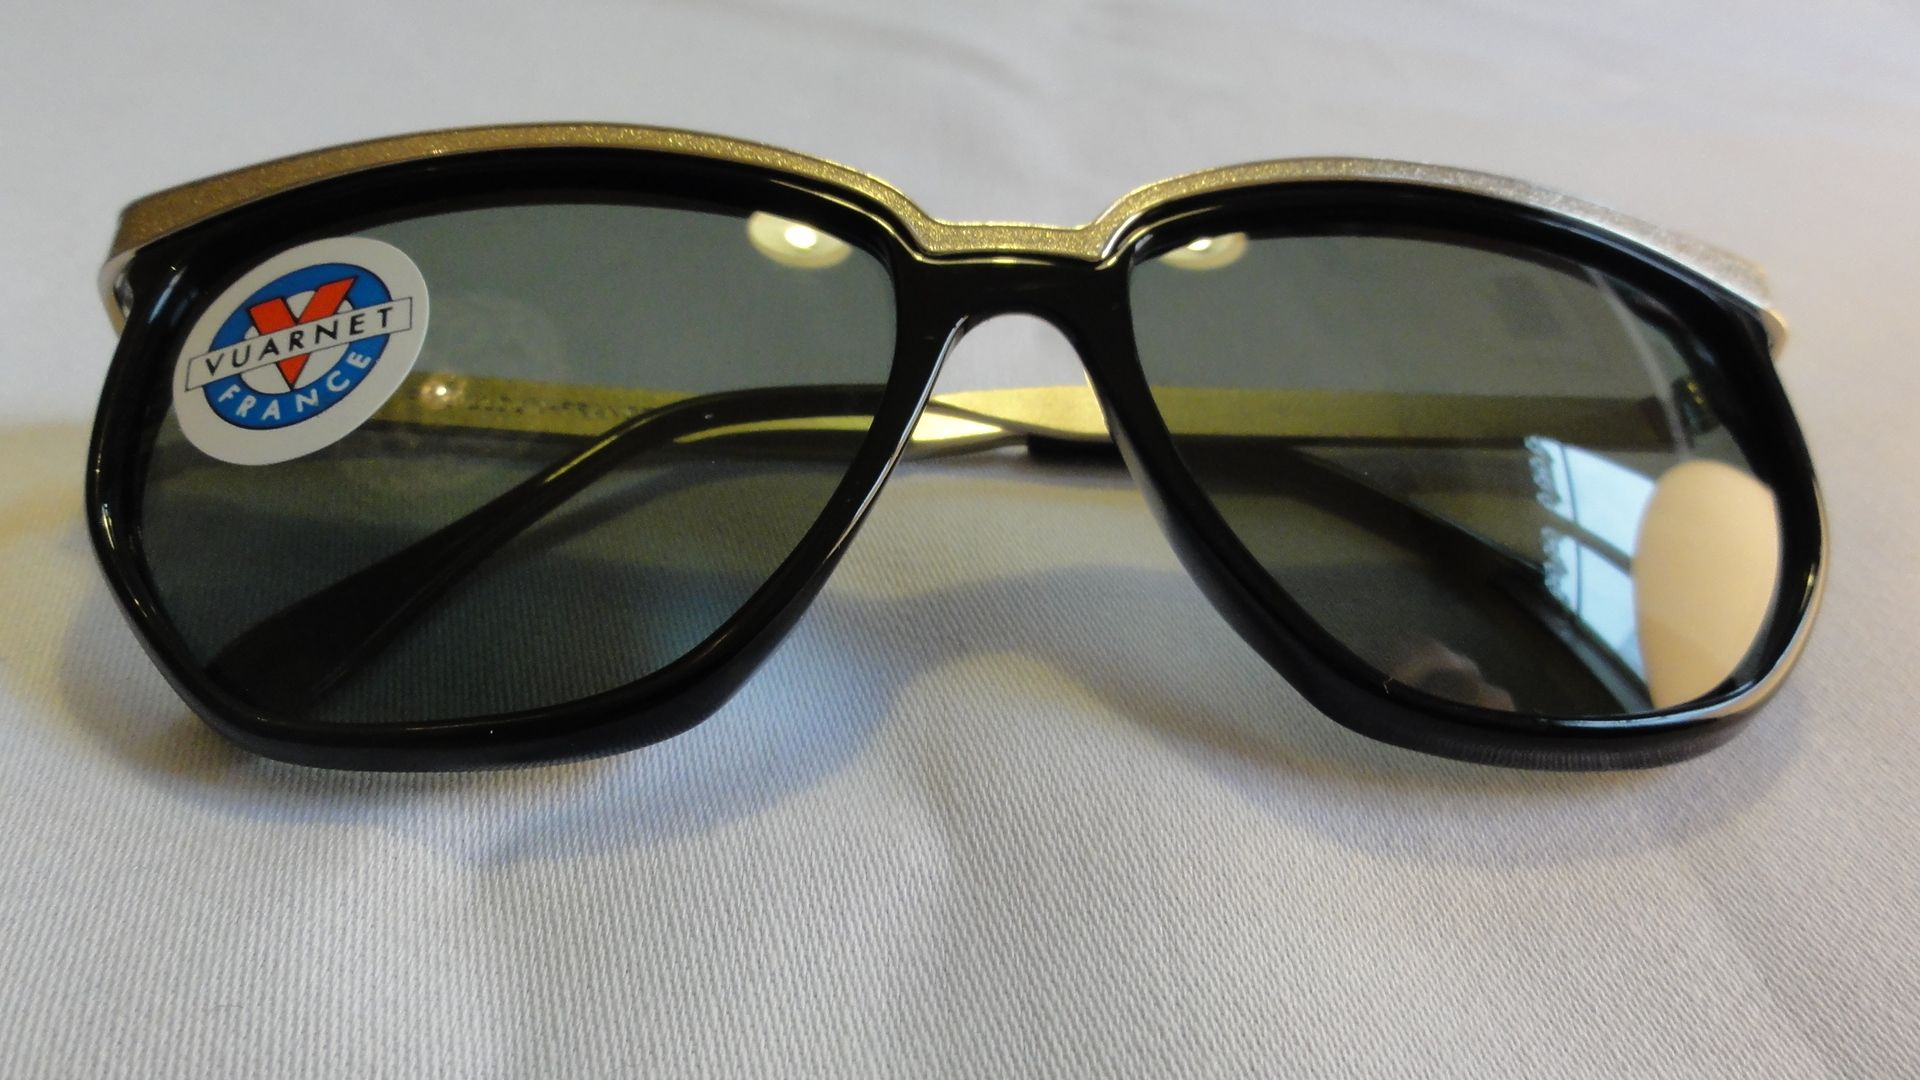 0db3ef8a9c VUARNET sunglasses vintage retro 092 Cateye Px 3000 NEW